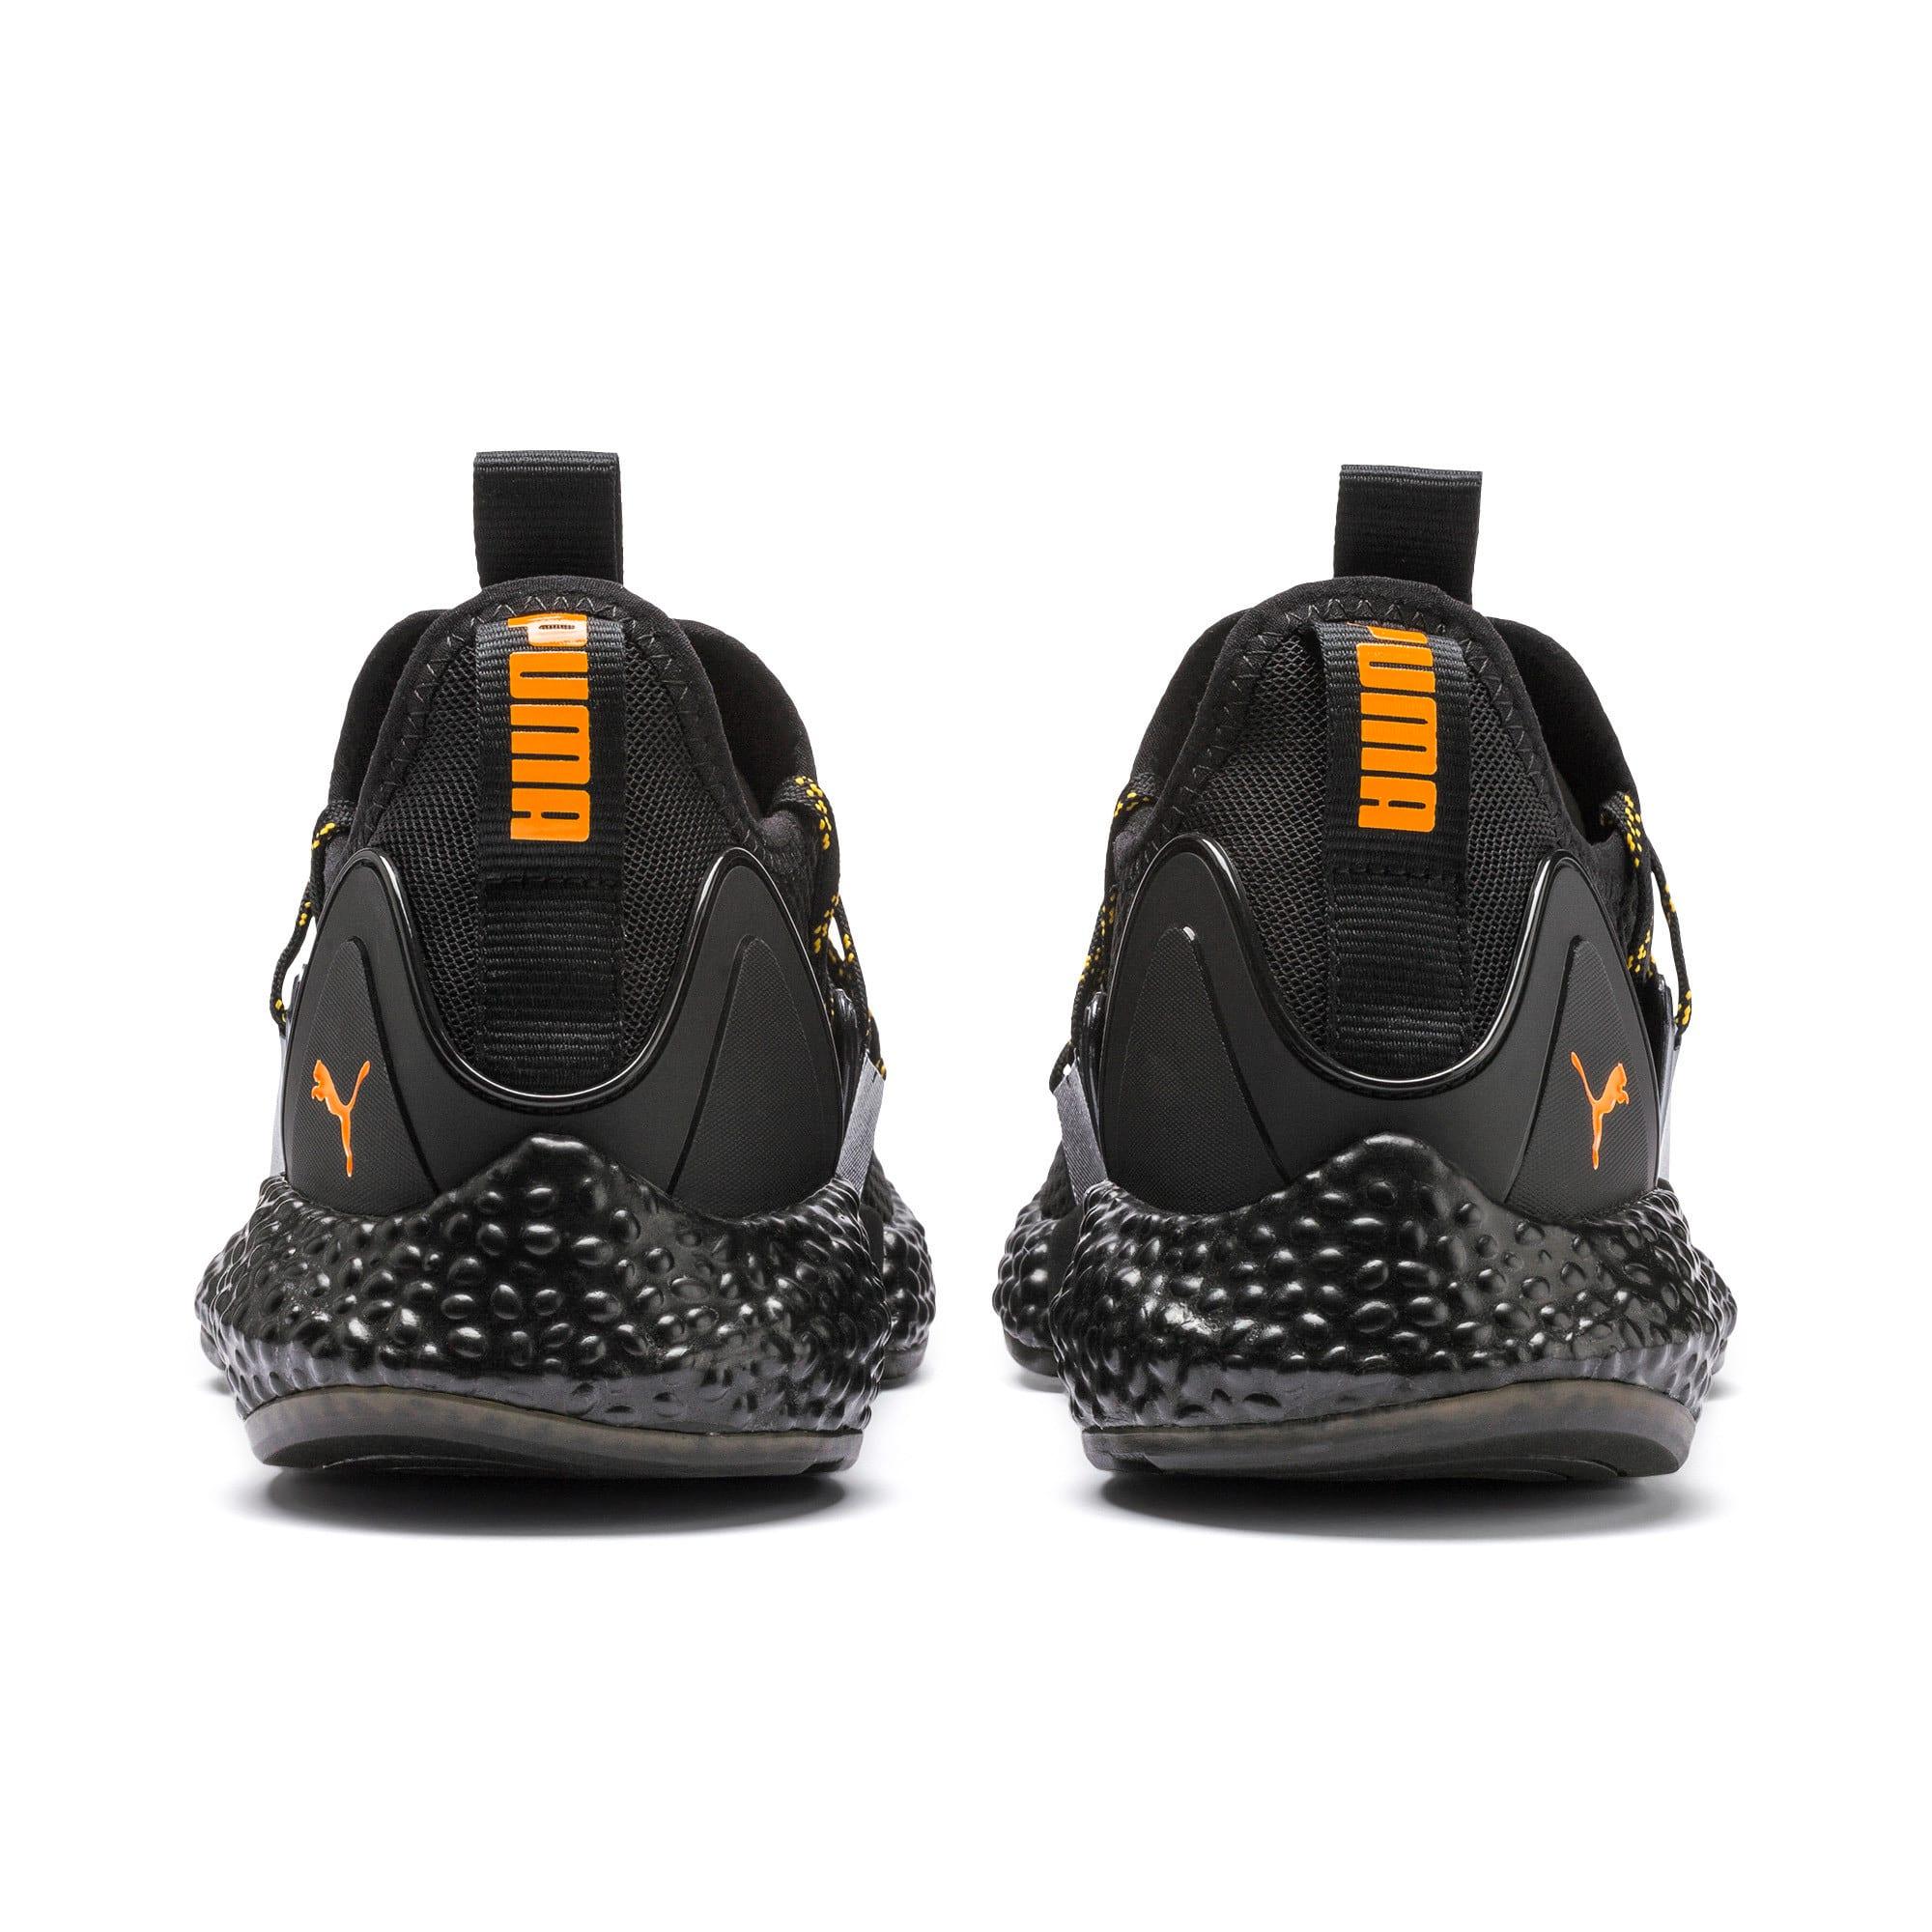 Thumbnail 4 of HYBRID Rocket Aero Men's Sneakers, Puma Black-Puma Black, medium